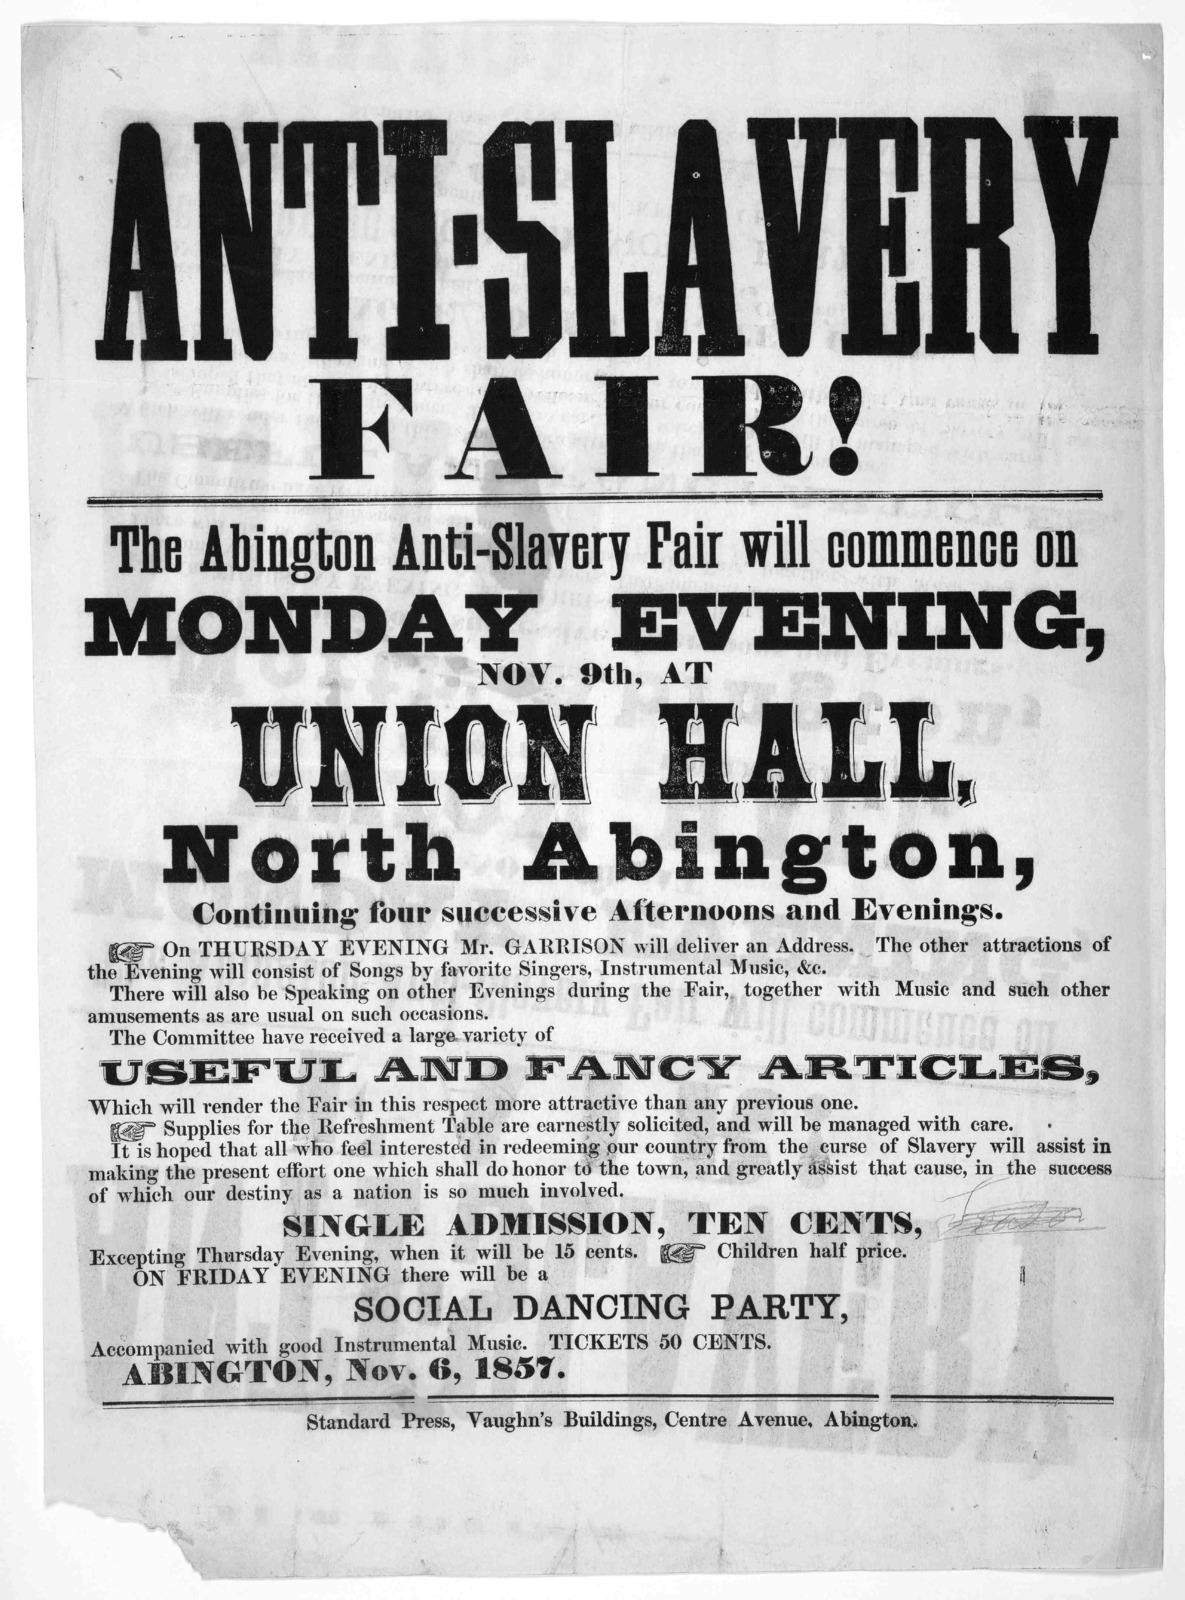 Anti-slavery fair! The Abington anti-slavery fair will commence on Monday evening, Nov. 9th, at Union Hall, North Abington ... Abington, Nov. 6, 1857. Abington. Standard Press, Vaughan's Building, Centre Avenue.